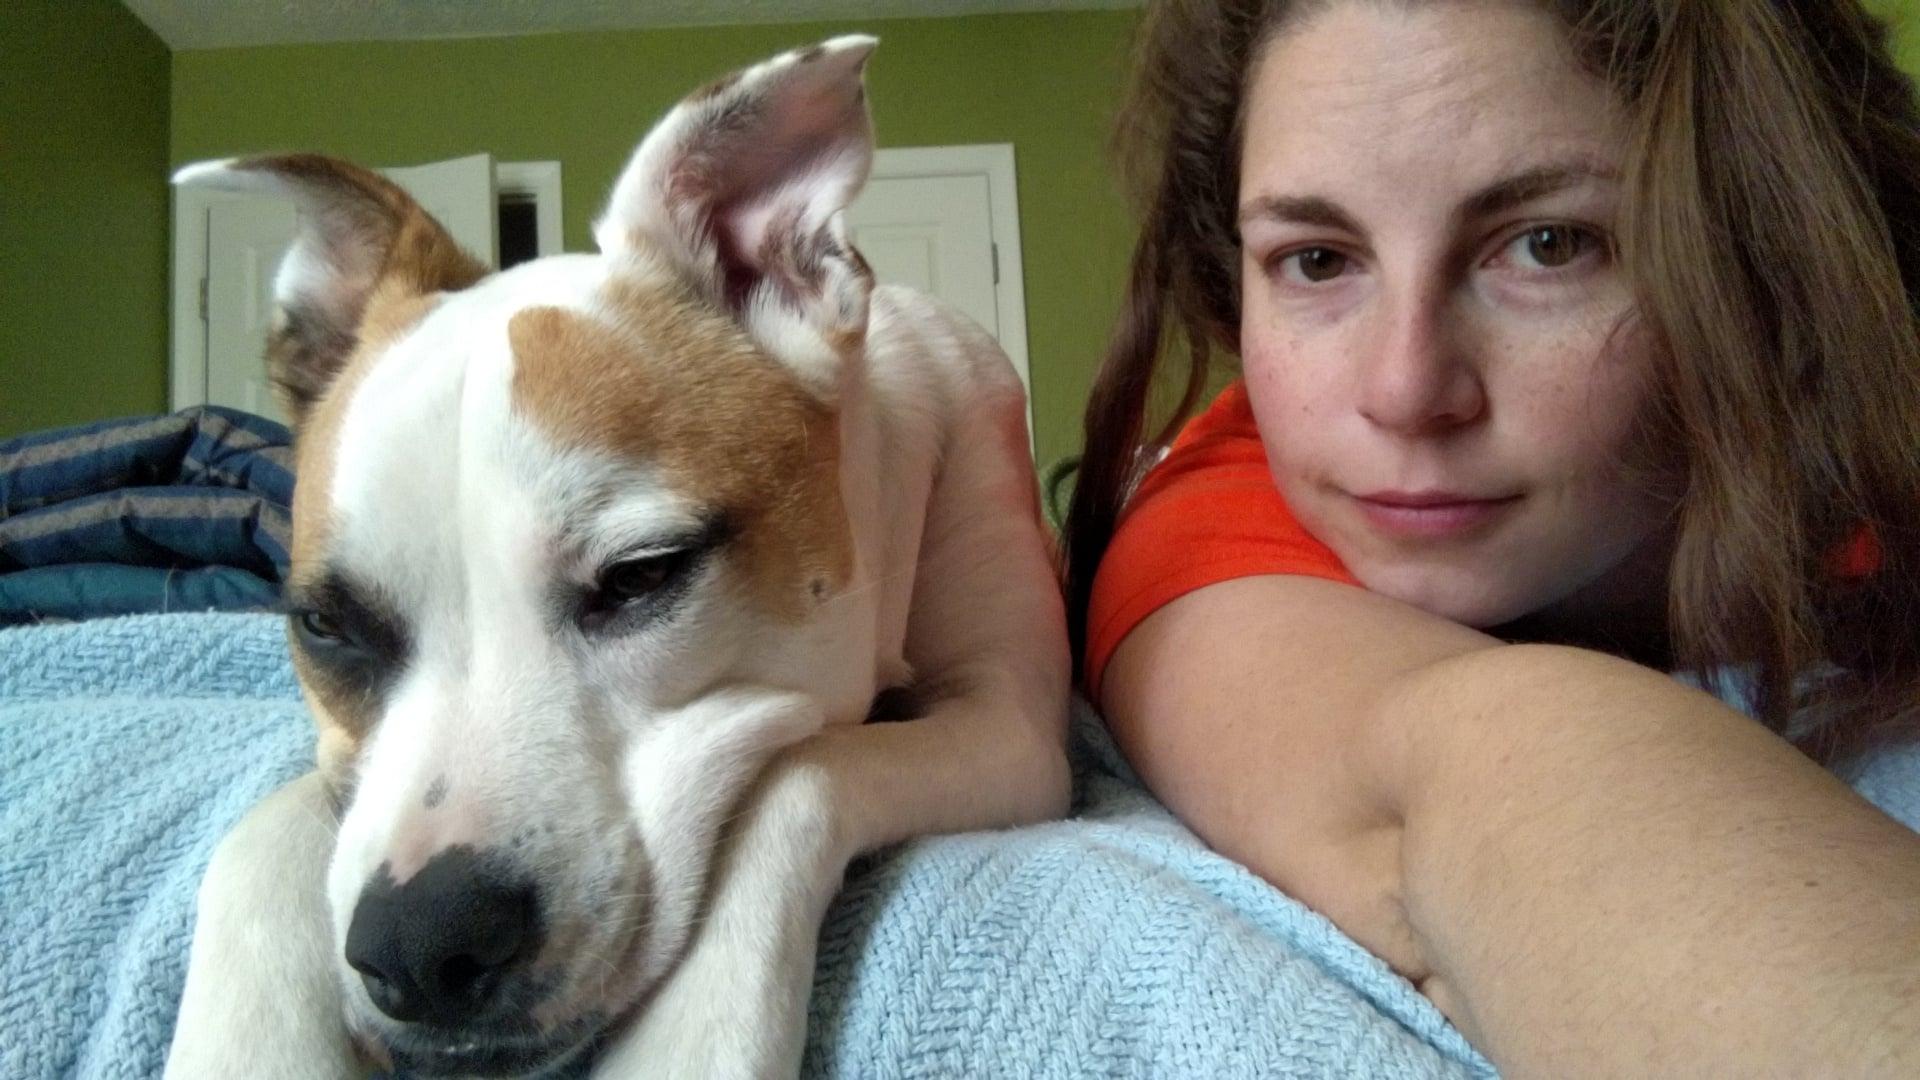 We woke up like this.